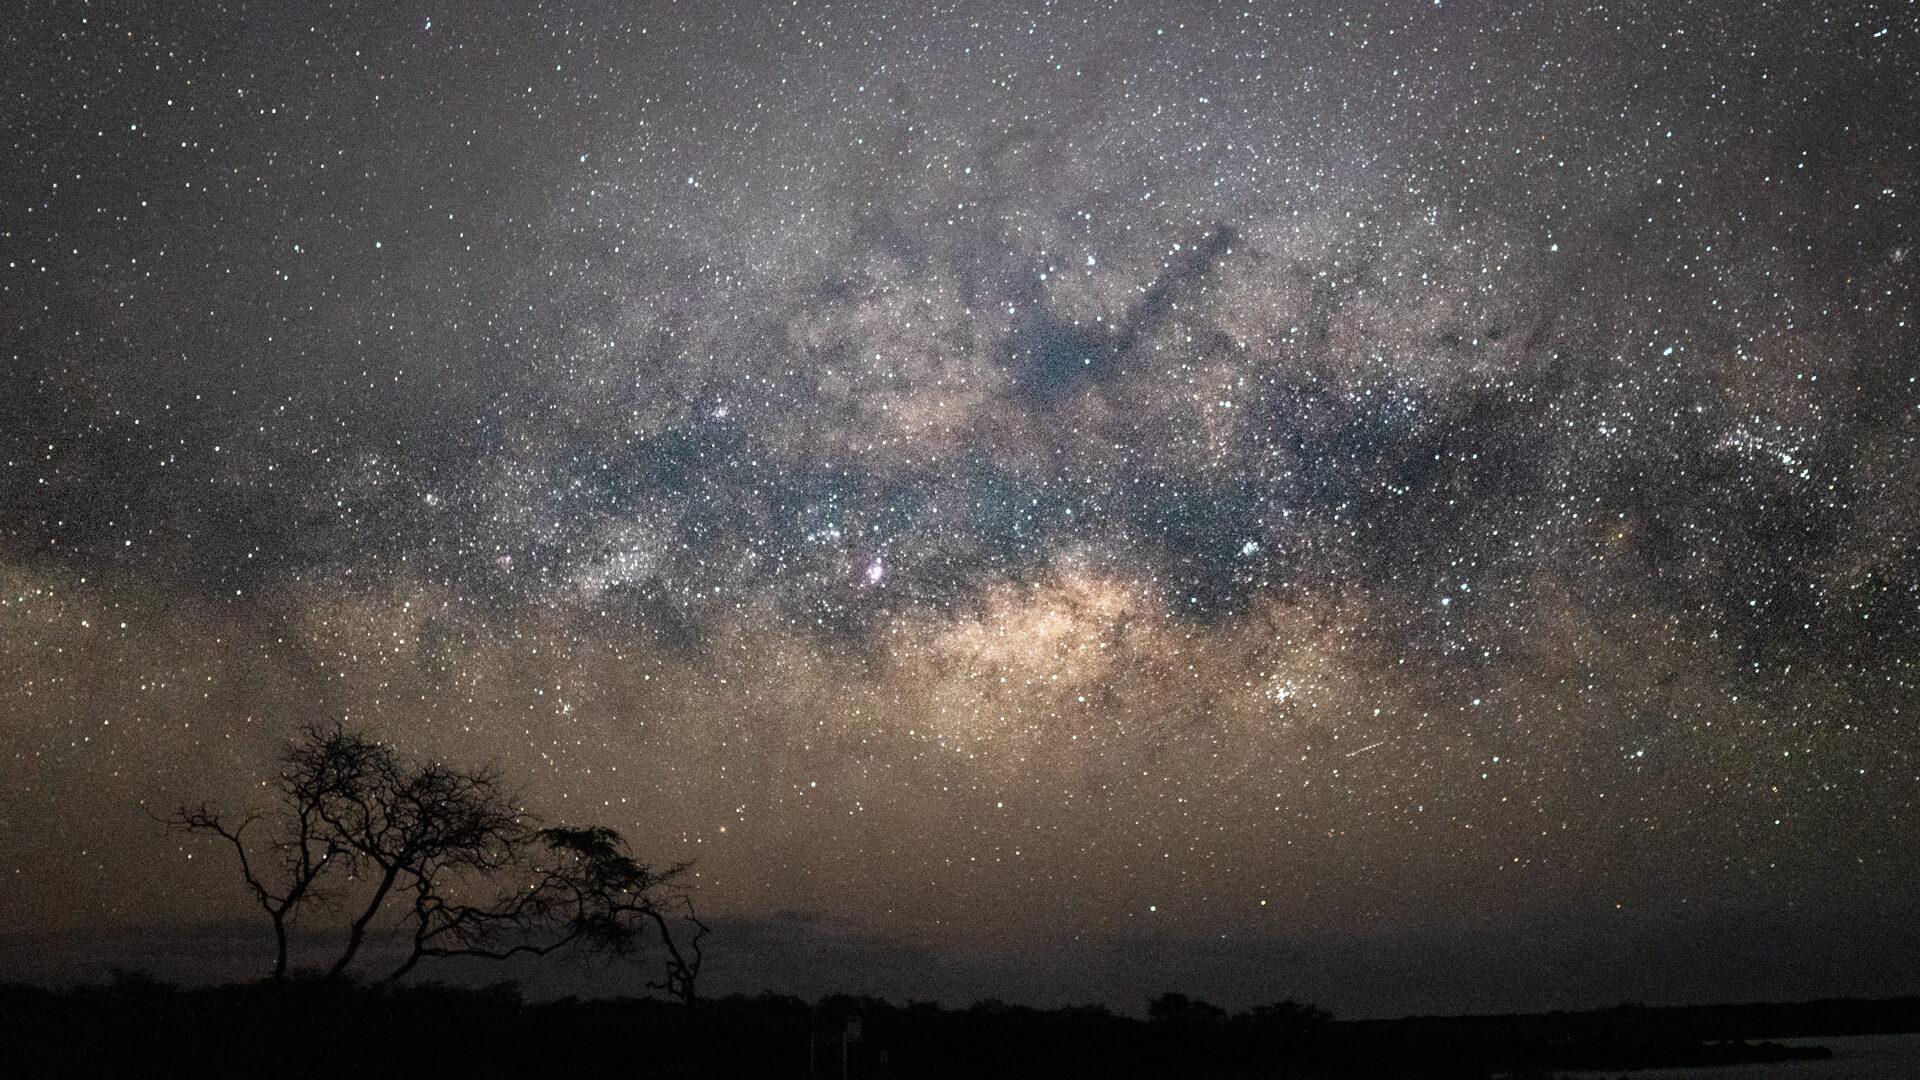 Astrophotography: Stargazing Souvenirs